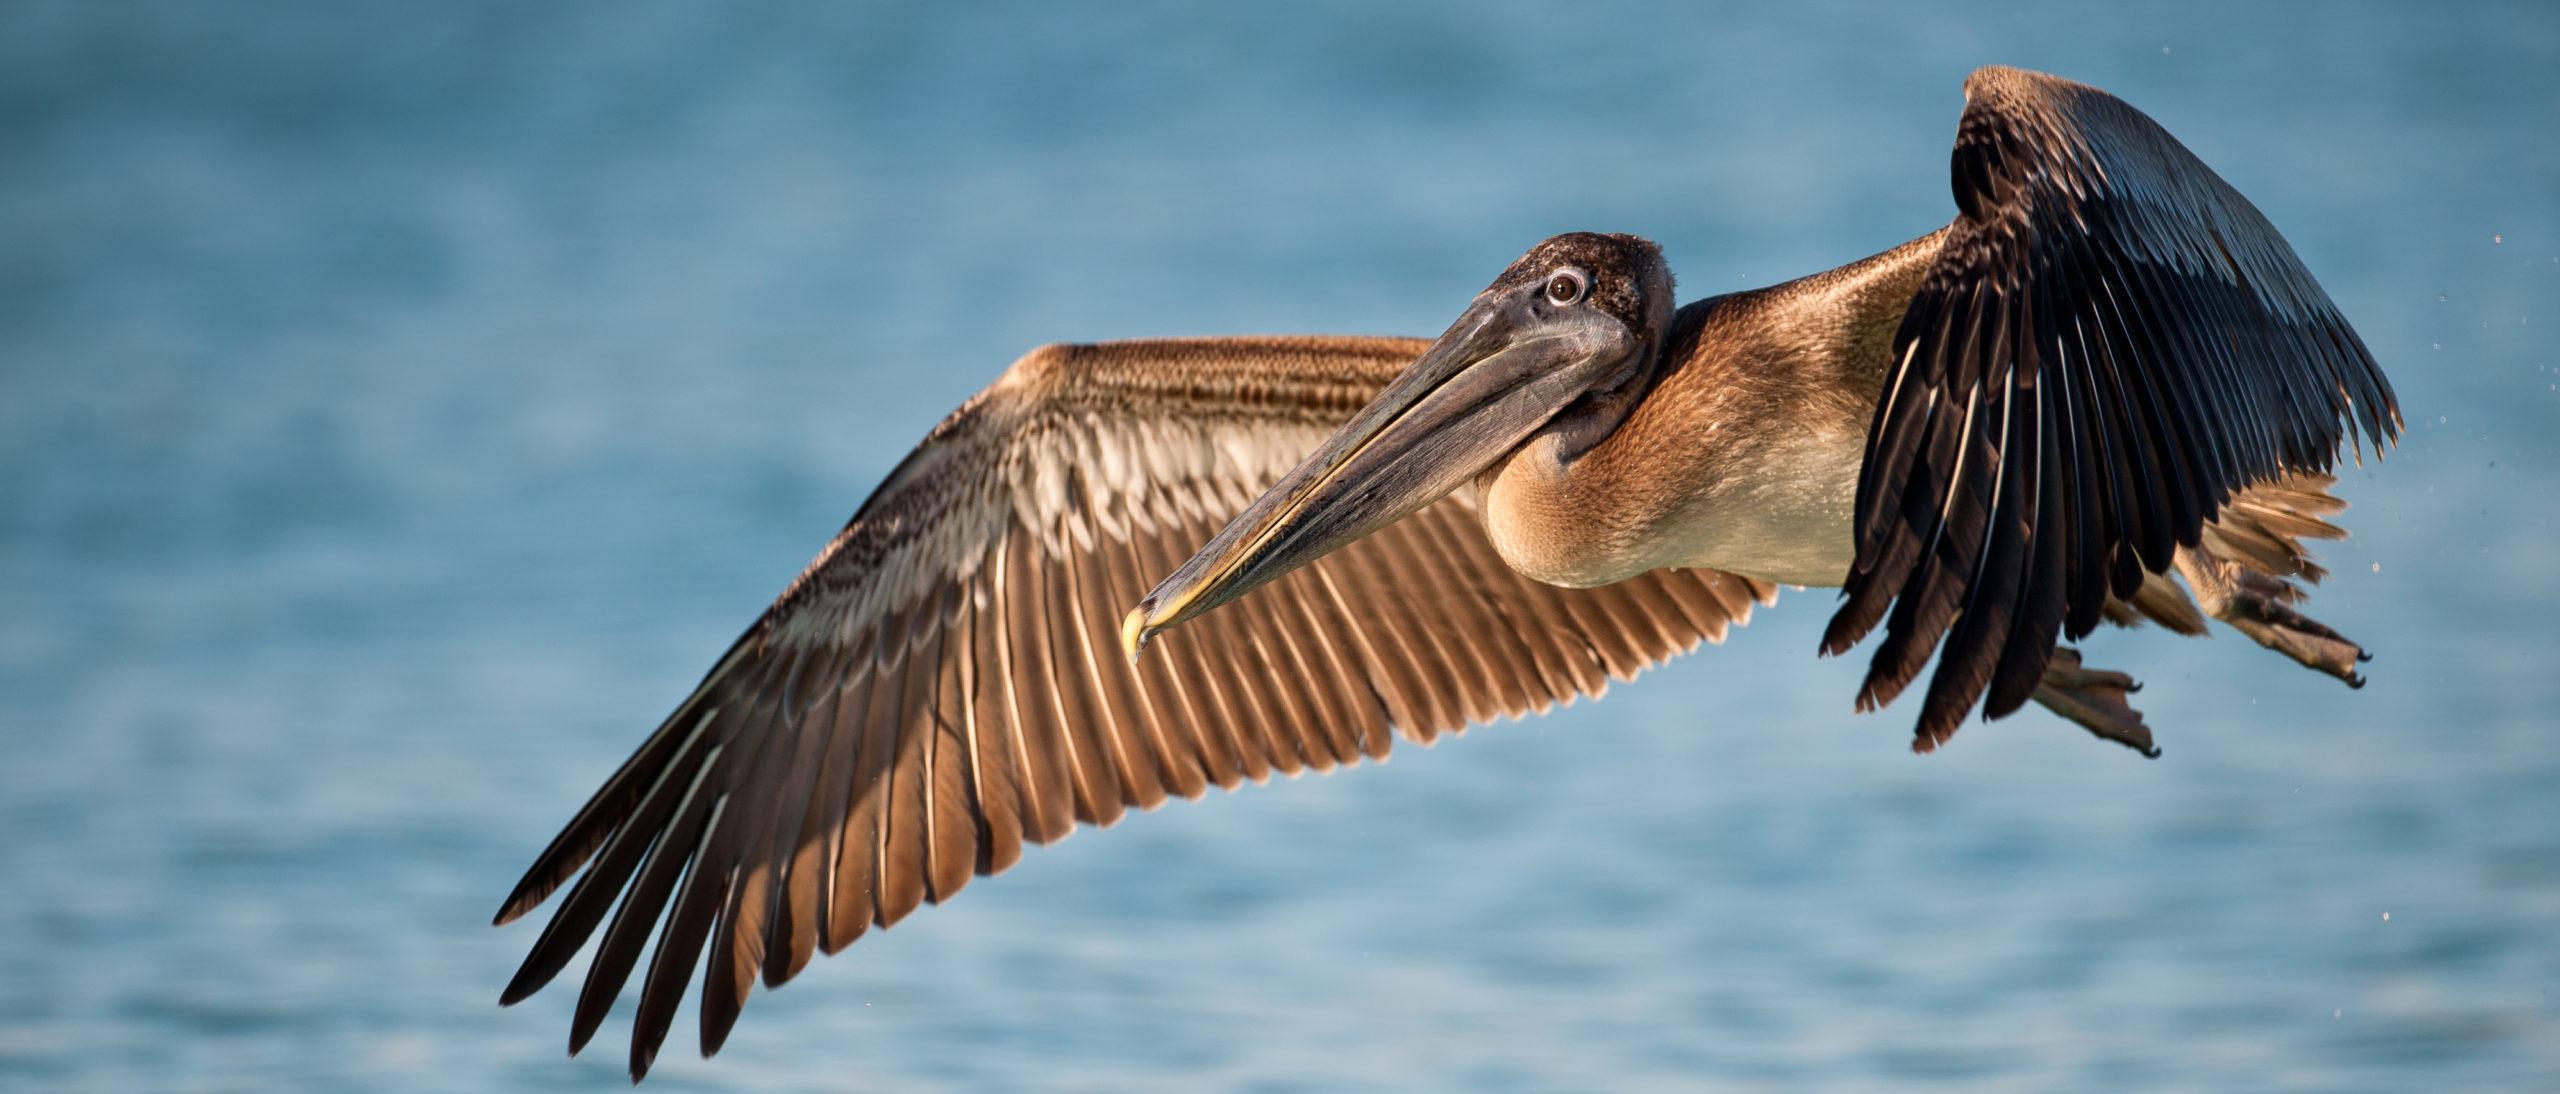 A Mysterious Serial Bird Killer Is Slashing Pelicans Throats Officials Offer Reward The Daily Caller